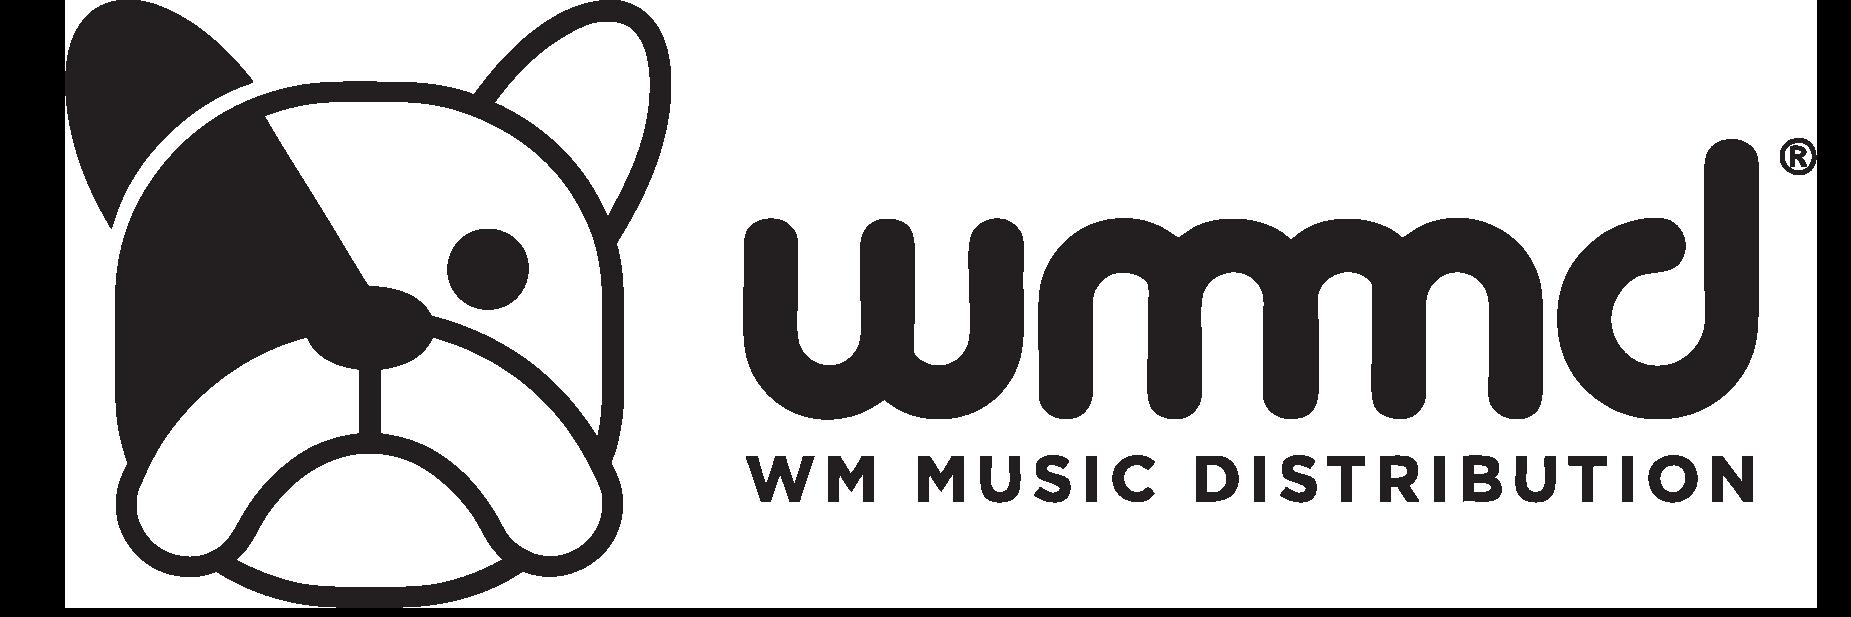 WMMD Tudasbázis